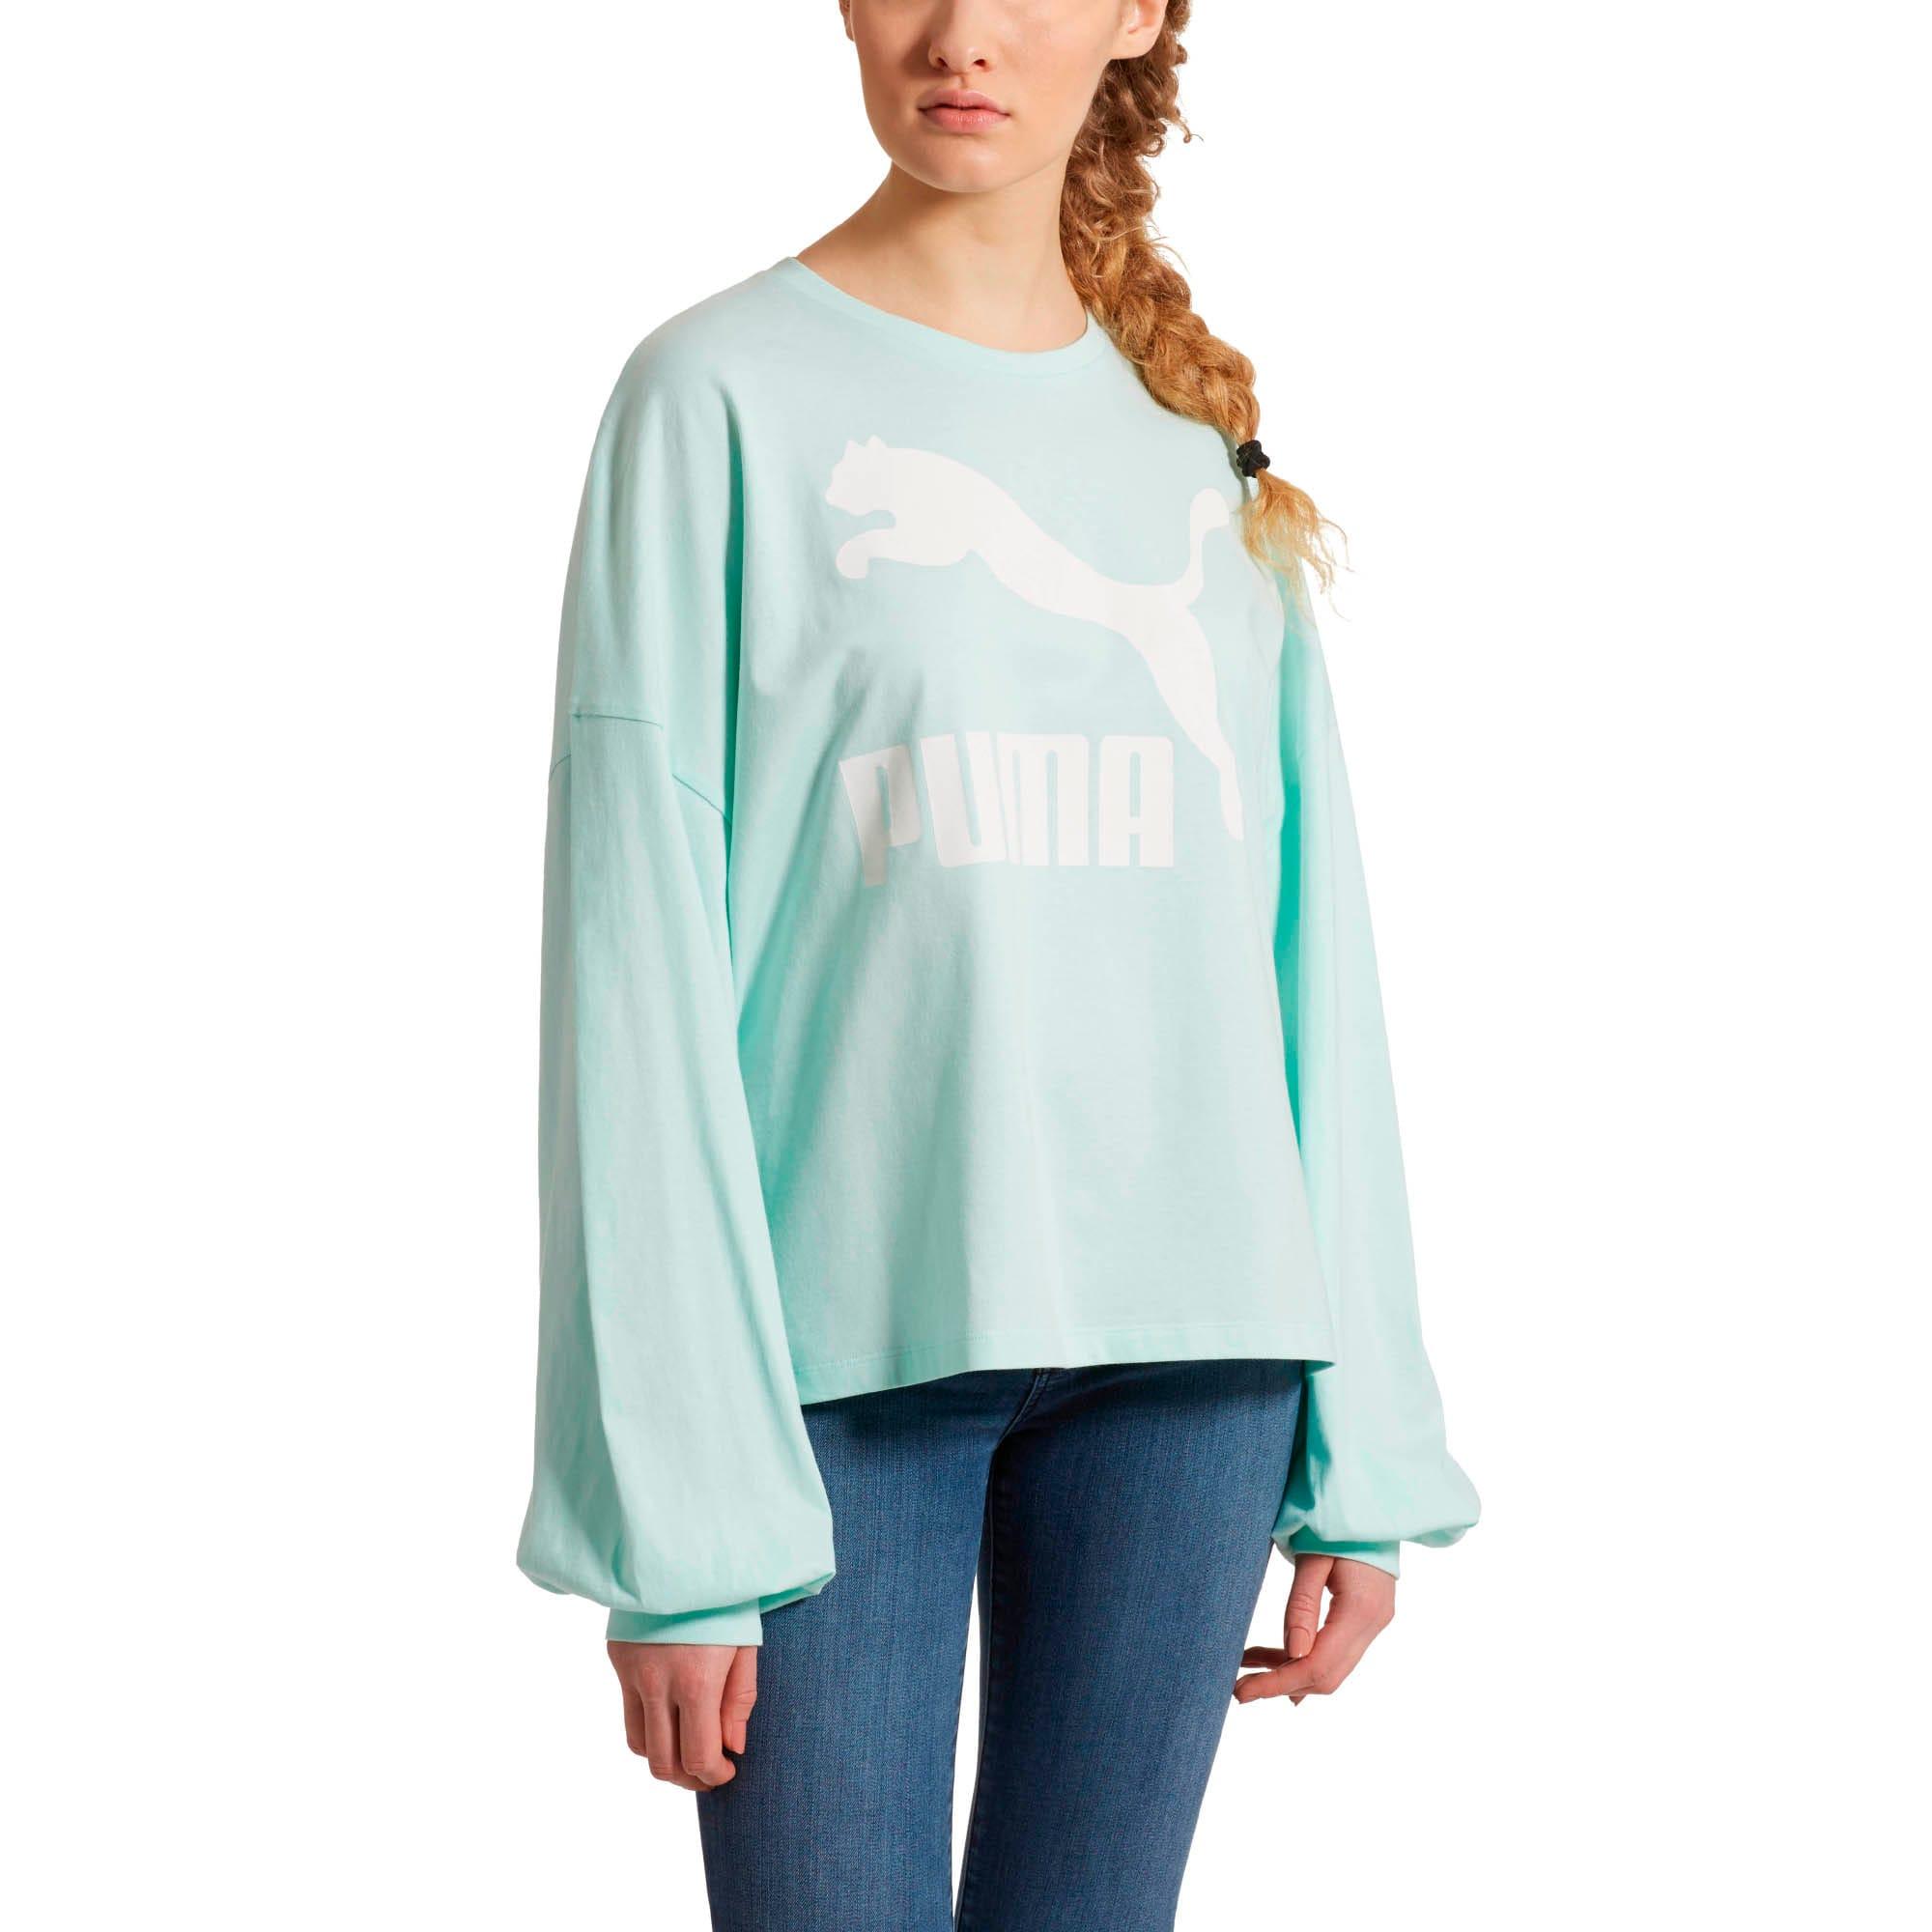 Miniatura 2 de Camiseta Classics de mangas largas con logo para mujer, Fair Aqua, mediano